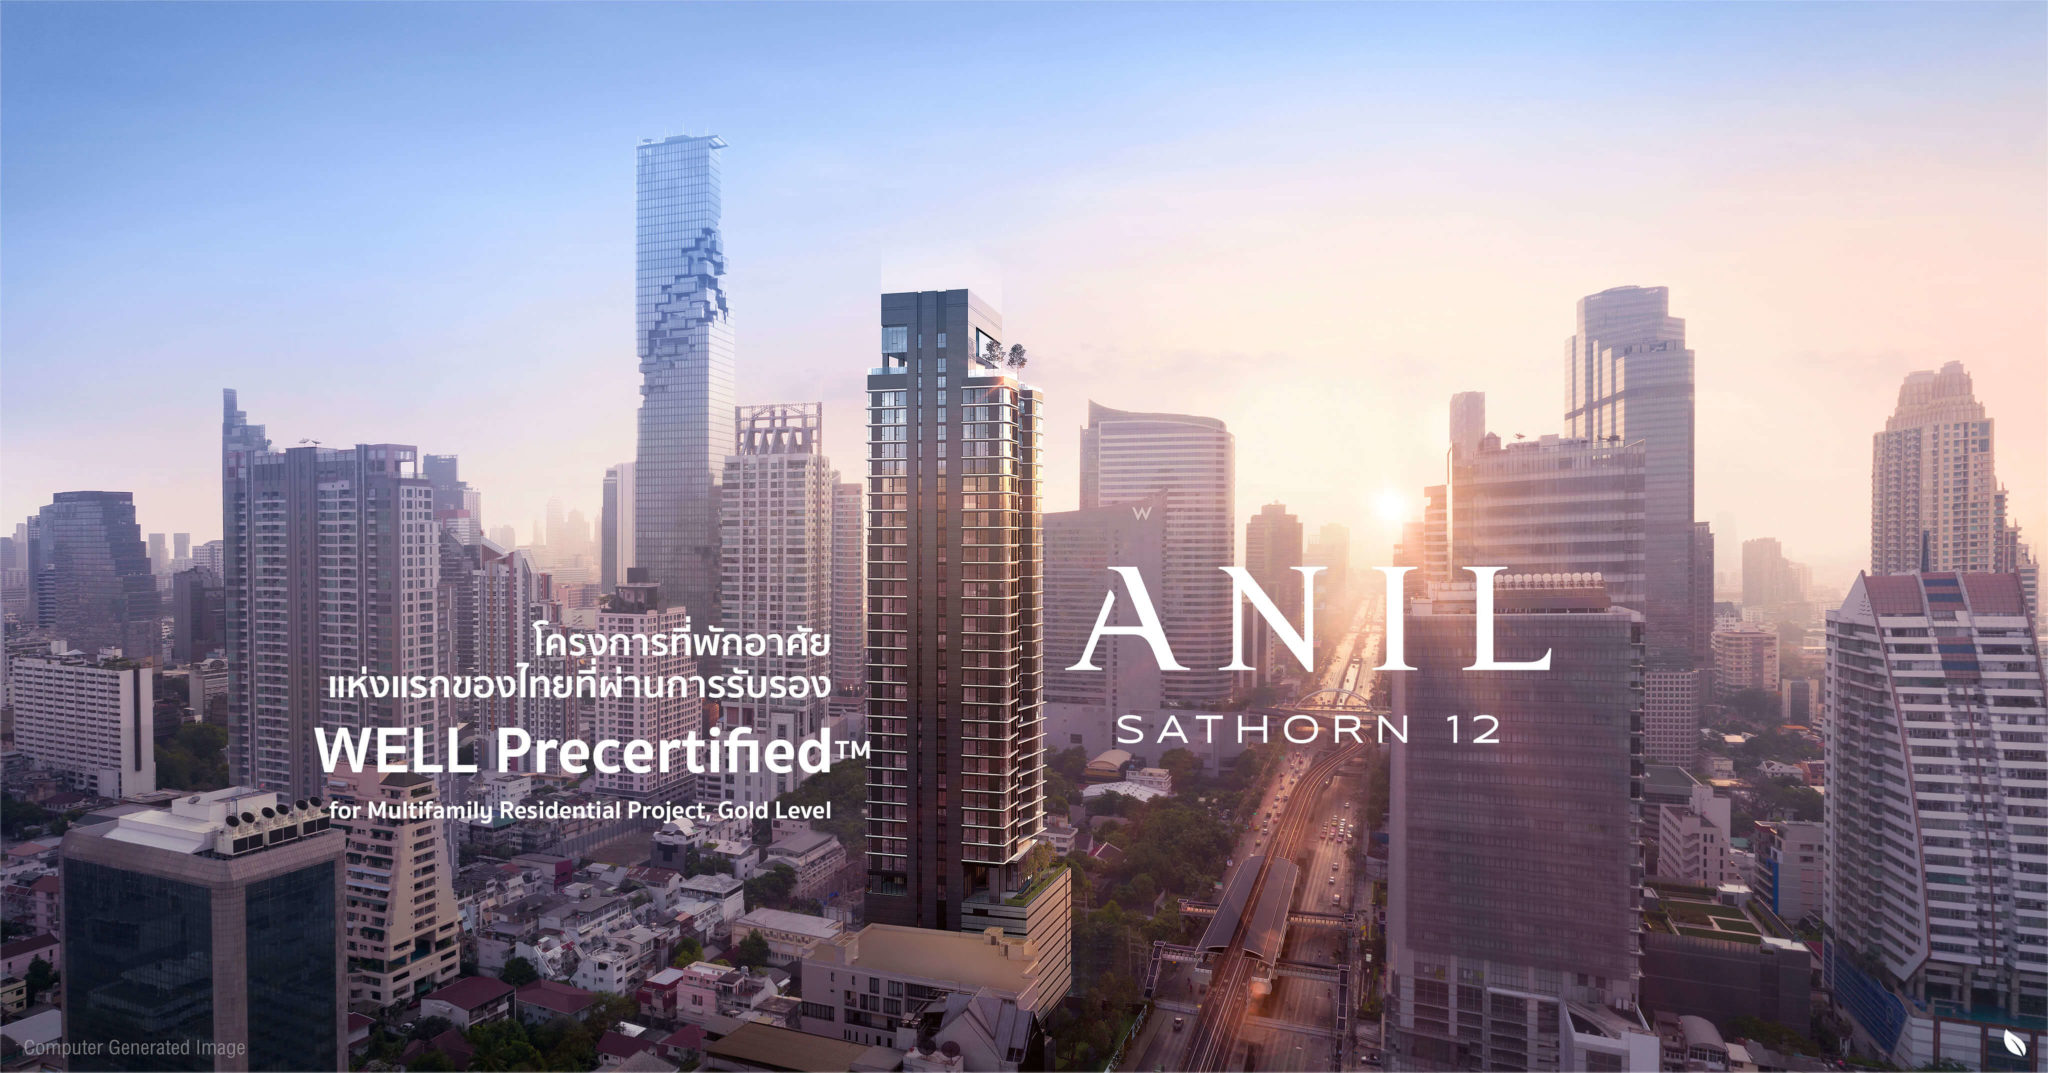 ANIL Sathorn 12 คอนโดสาทรสุดหรูที่ยกระดับคุณภาพชีวิตของผู้พักอาศัย ด้วยมาตรฐาน WELL Building Standard 13 - GRAND UNITY